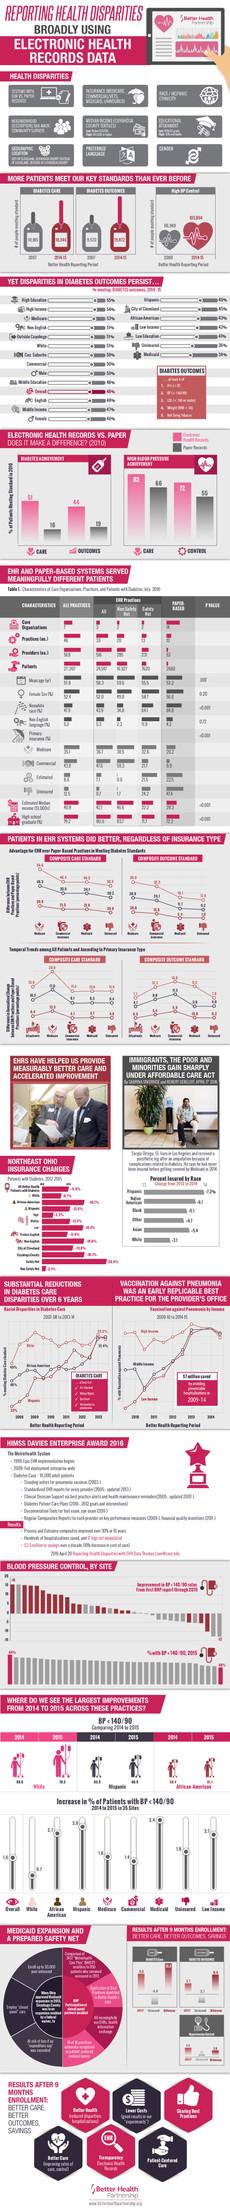 Reporting Health Disparities Broadly Using Electronic Health